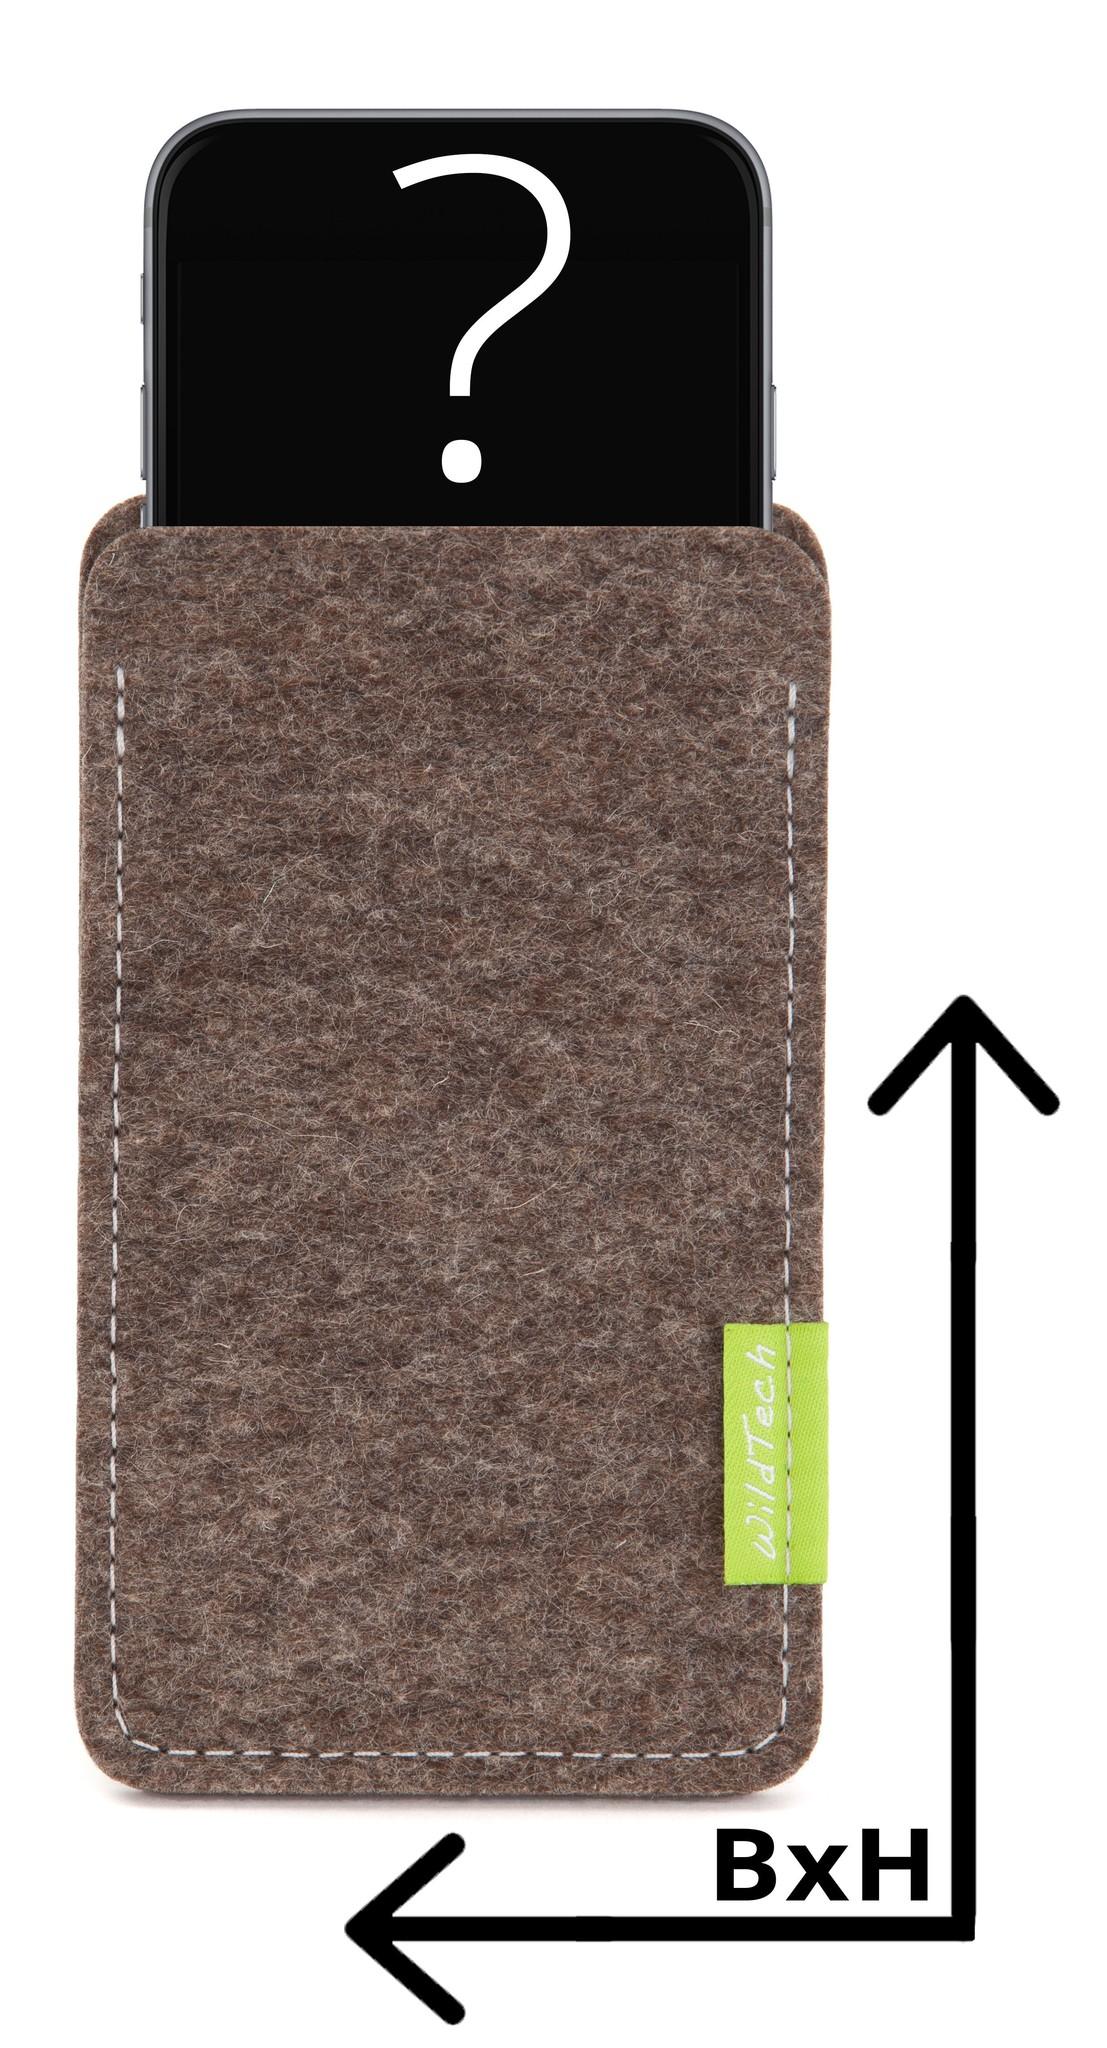 Individuelles Smartphone Sleeve Natur-Meliert-1